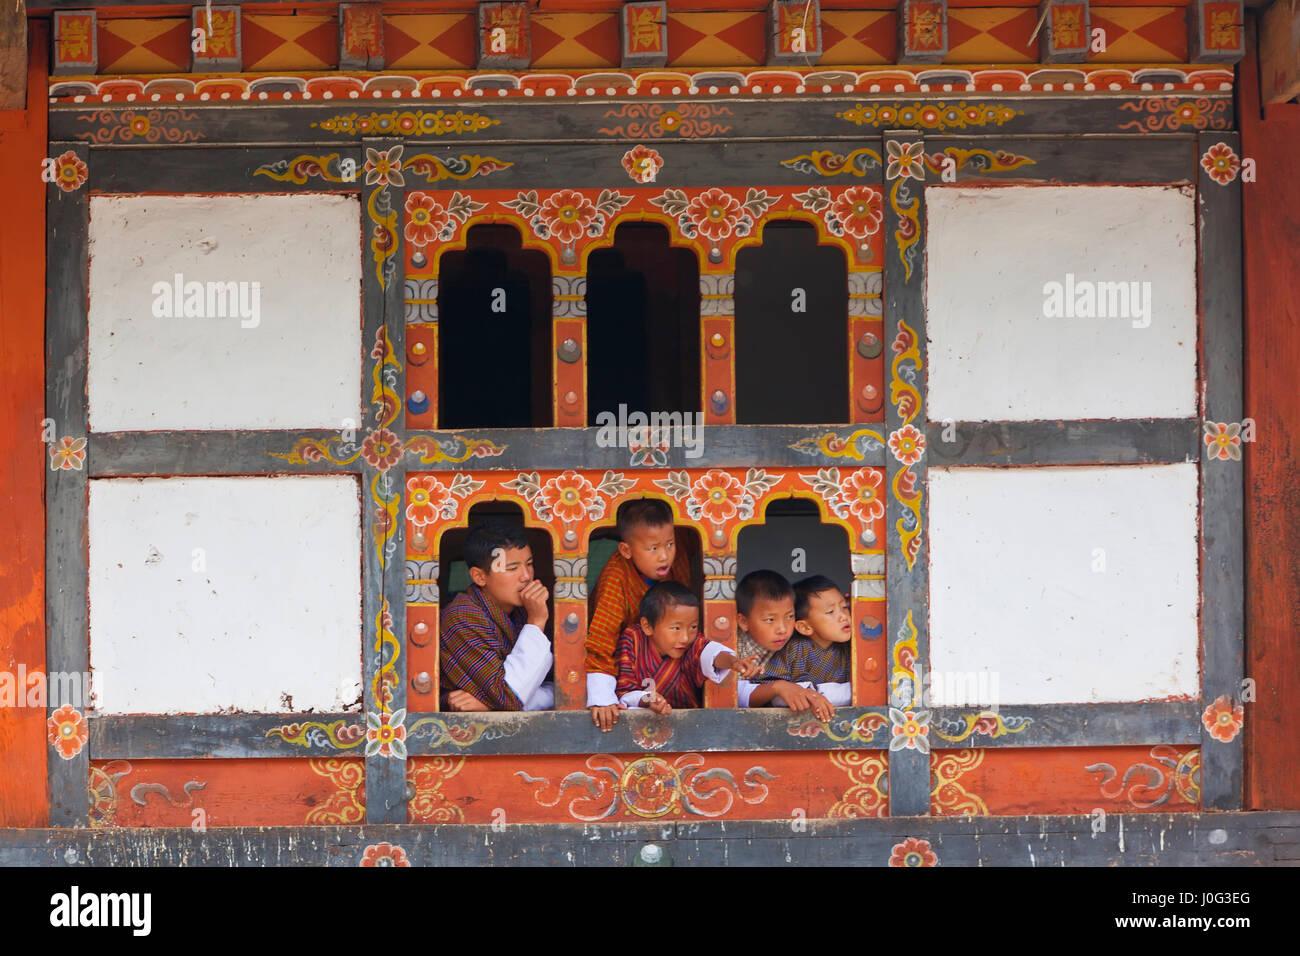 Tshechu Festival at Wangdue Phodrang Dzong Wangdi Bhutan - Stock Image